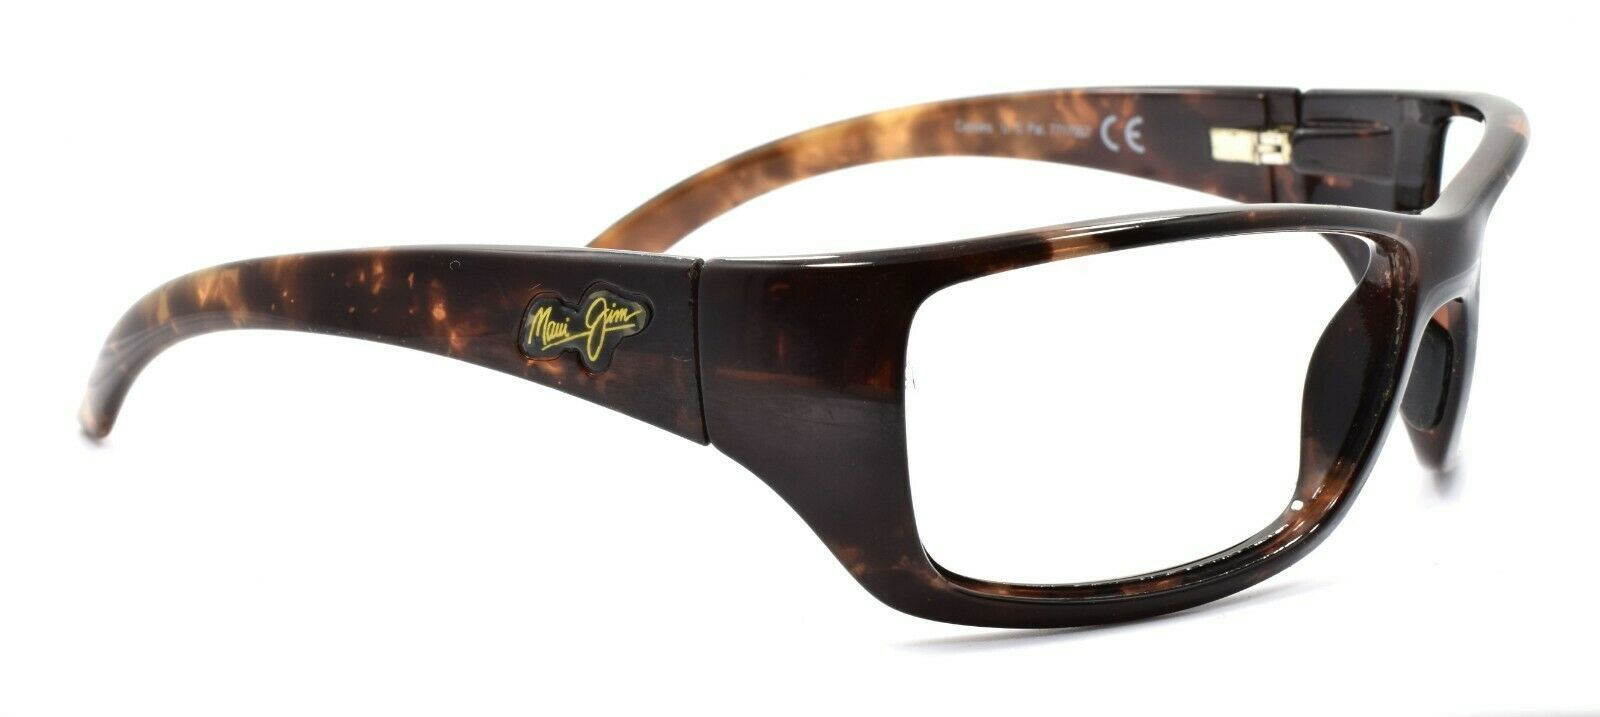 Maui Jim MJ-208-10 Canoes Sunglasses Tortoise 65 mm Wraparound FRAME ONLY